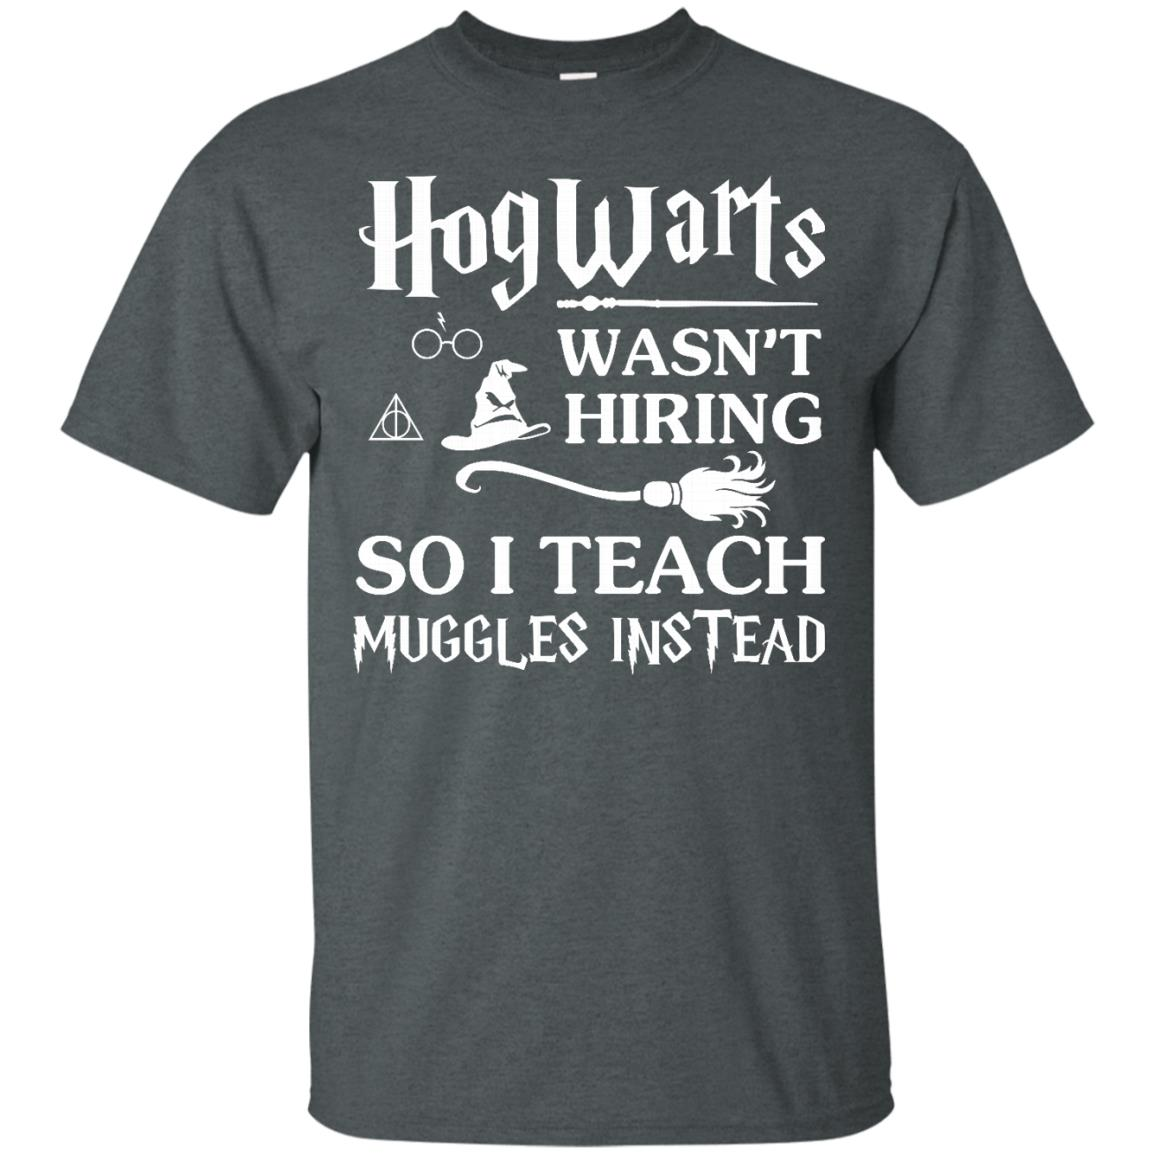 image 271px Hogwarts Wasn't Hiring So I Teach Muggles Instead T Shirts, Hoodies, Tank Top